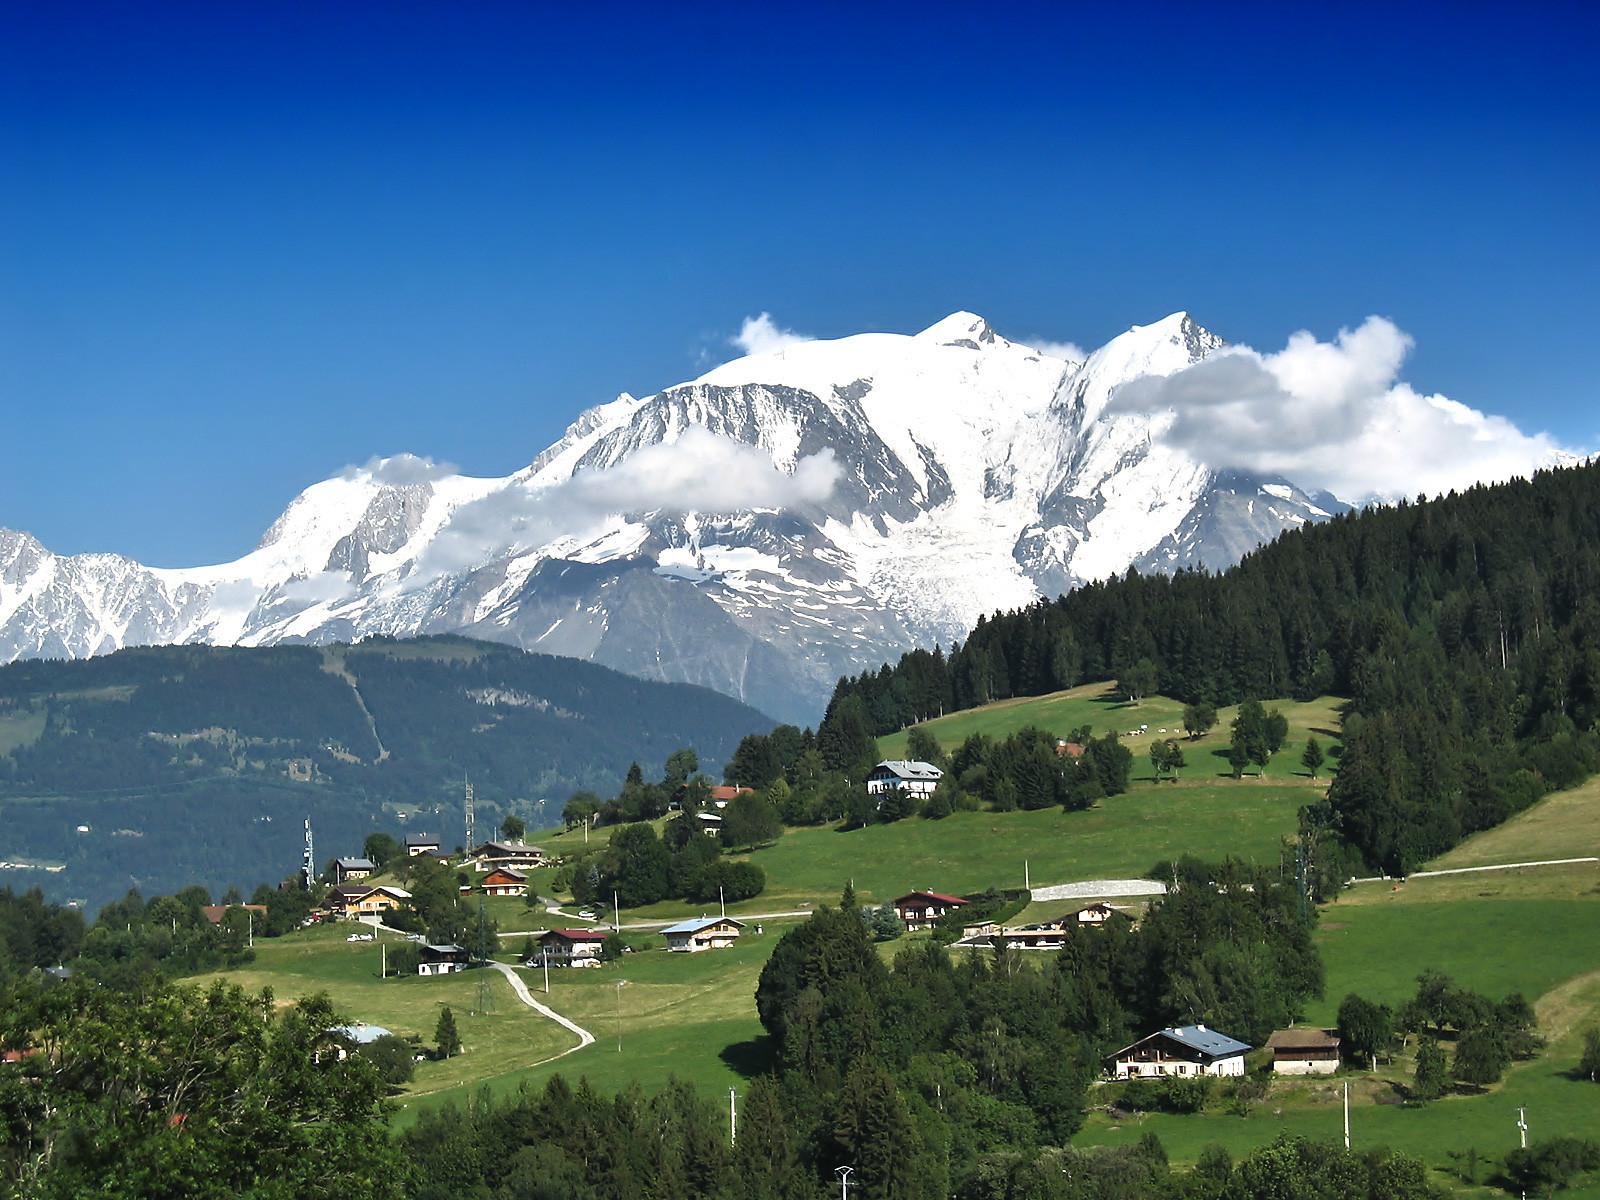 Franţa/Italia - Mont Blanc - 4810 metri